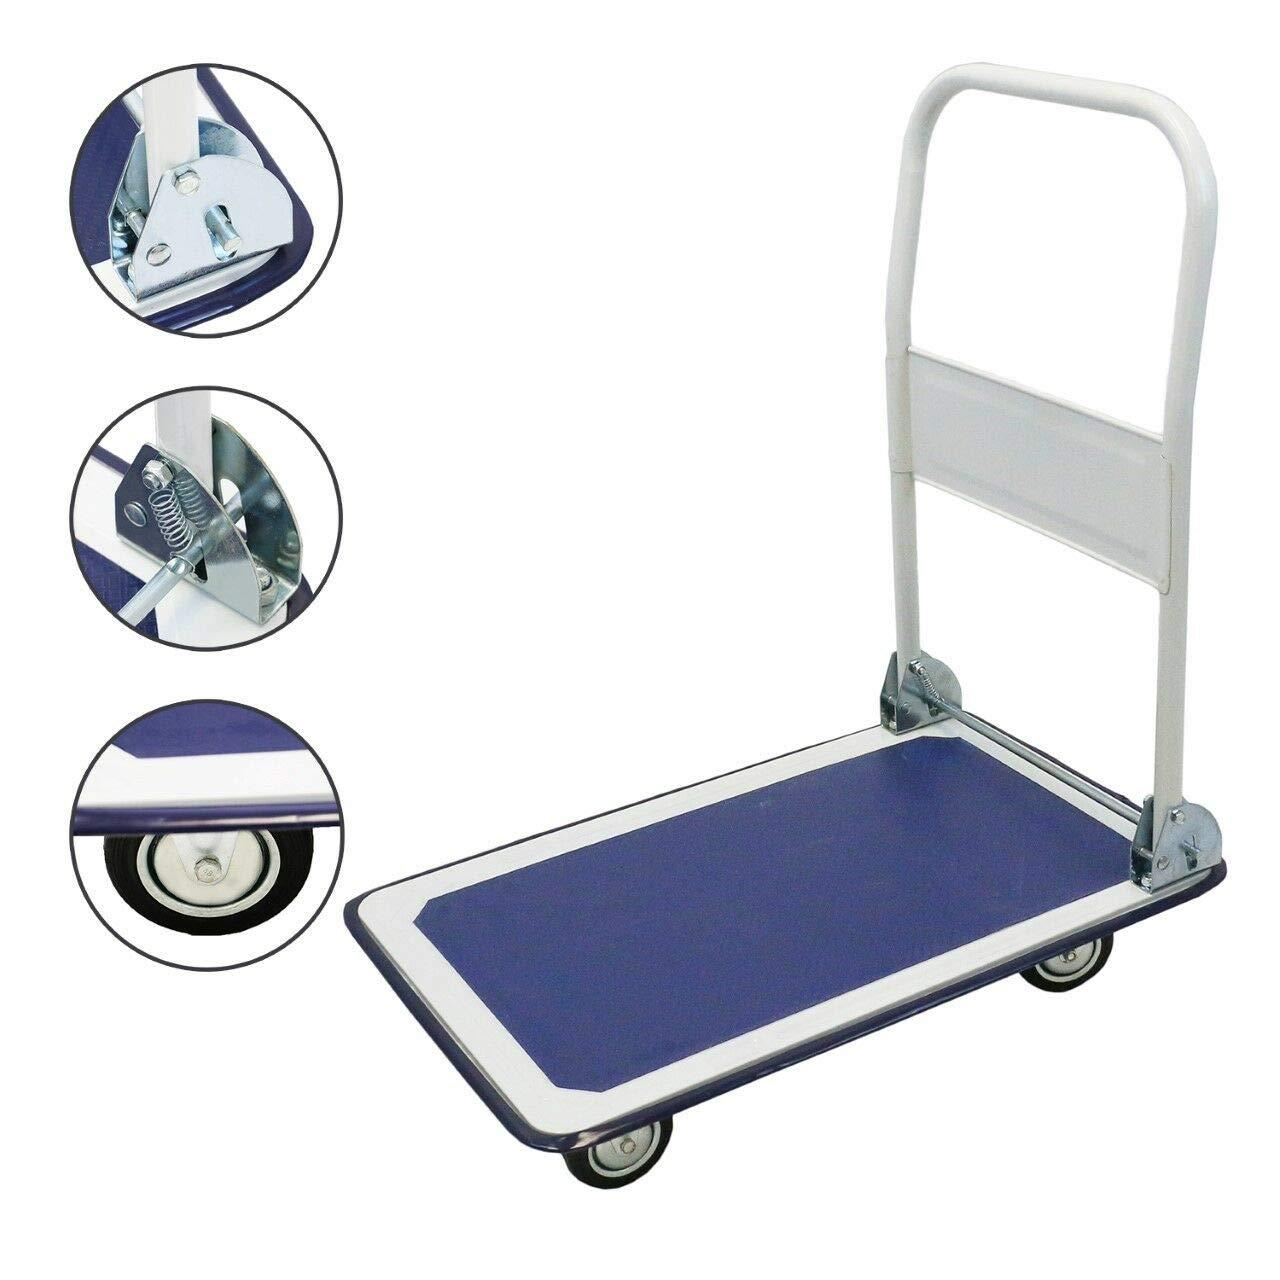 New Platform Cart Folding Dolly Moving Push Hand Truck Warehouse - 330lbs Blue